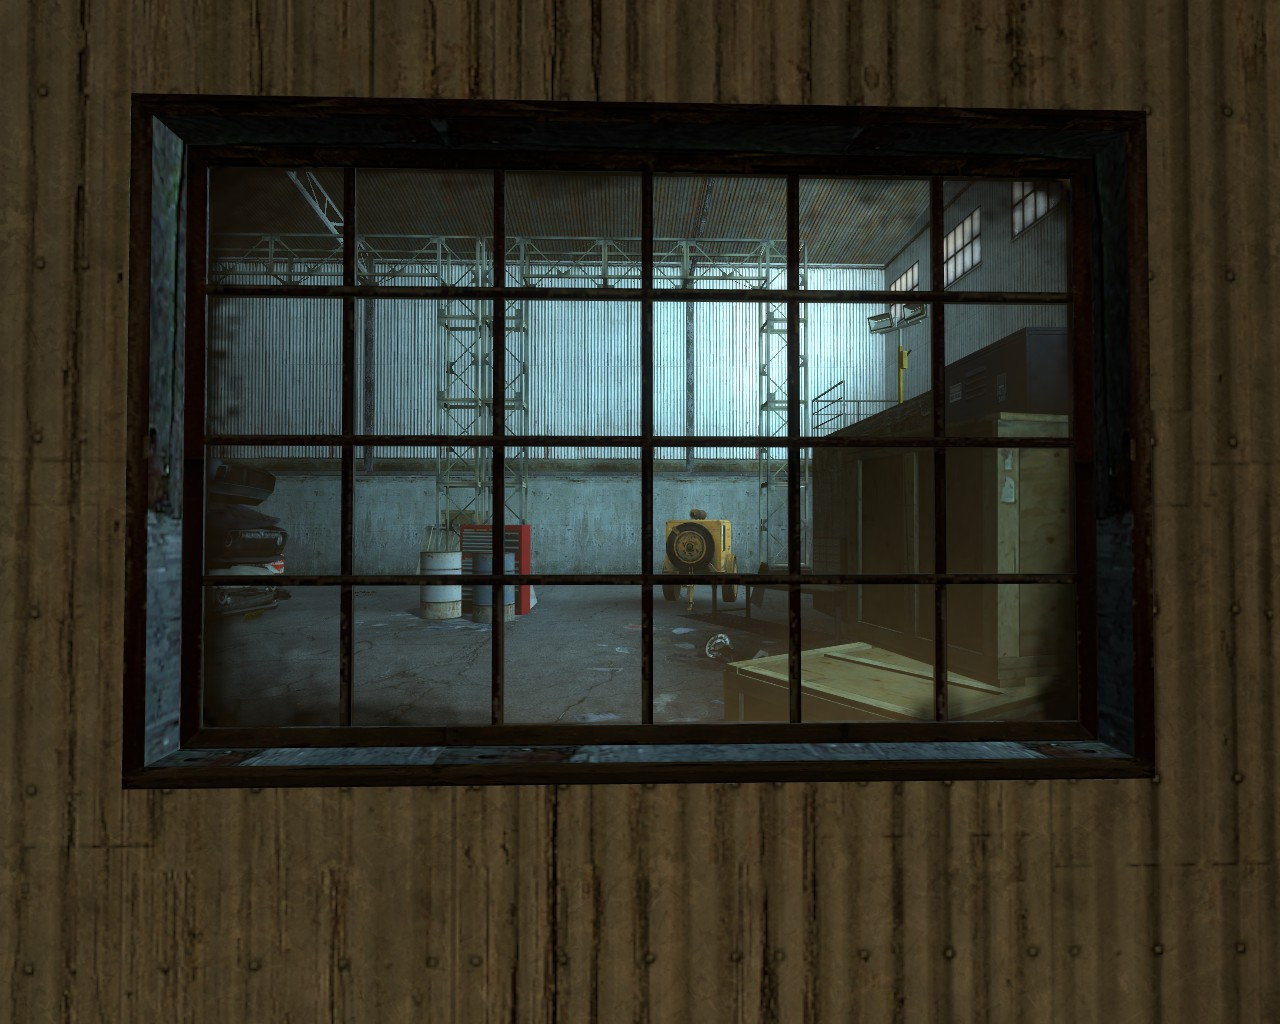 d1_town_050004.jpg - Half-Life 2